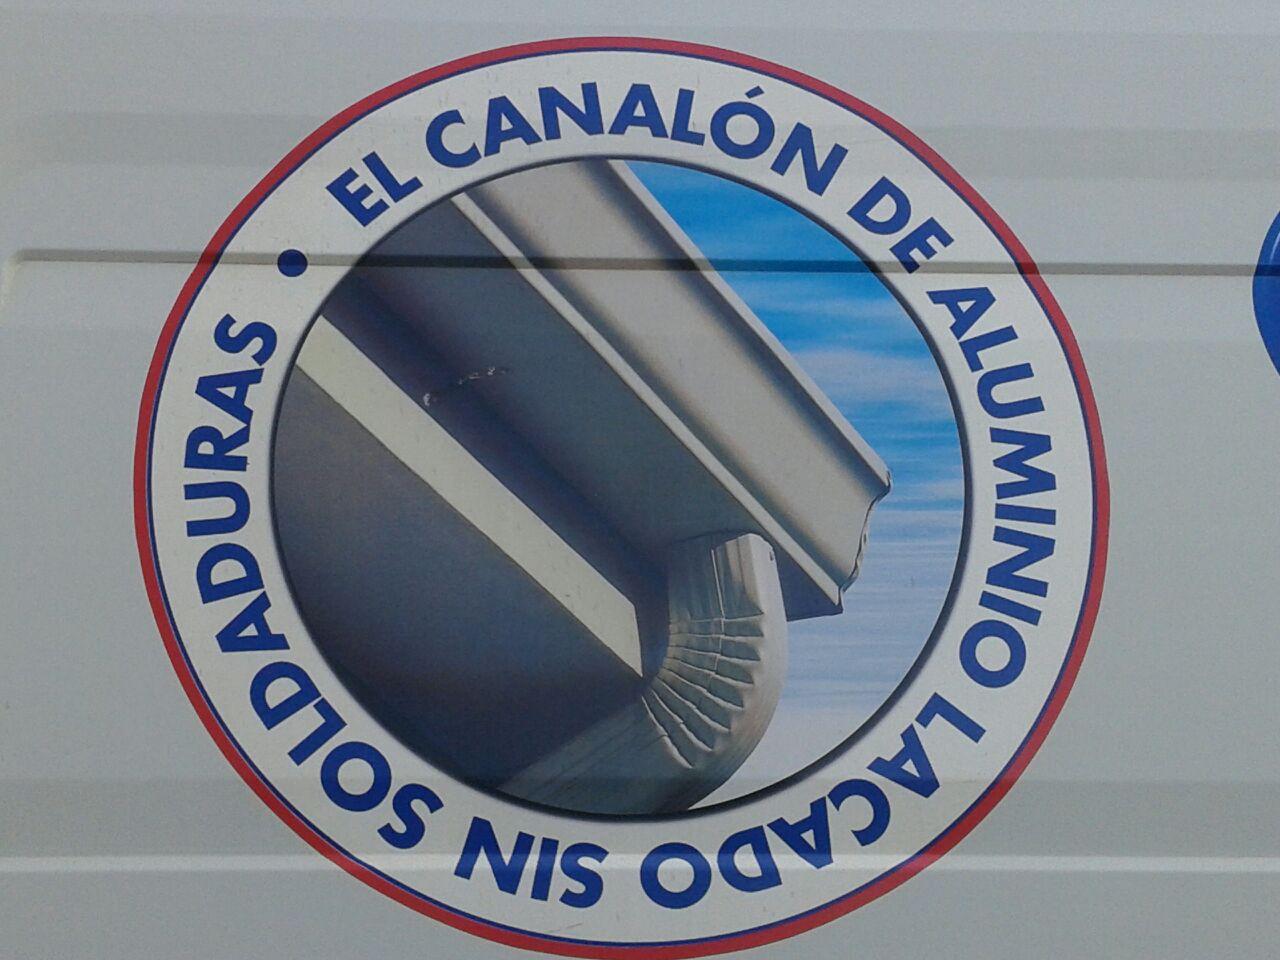 Canalac, S.c.